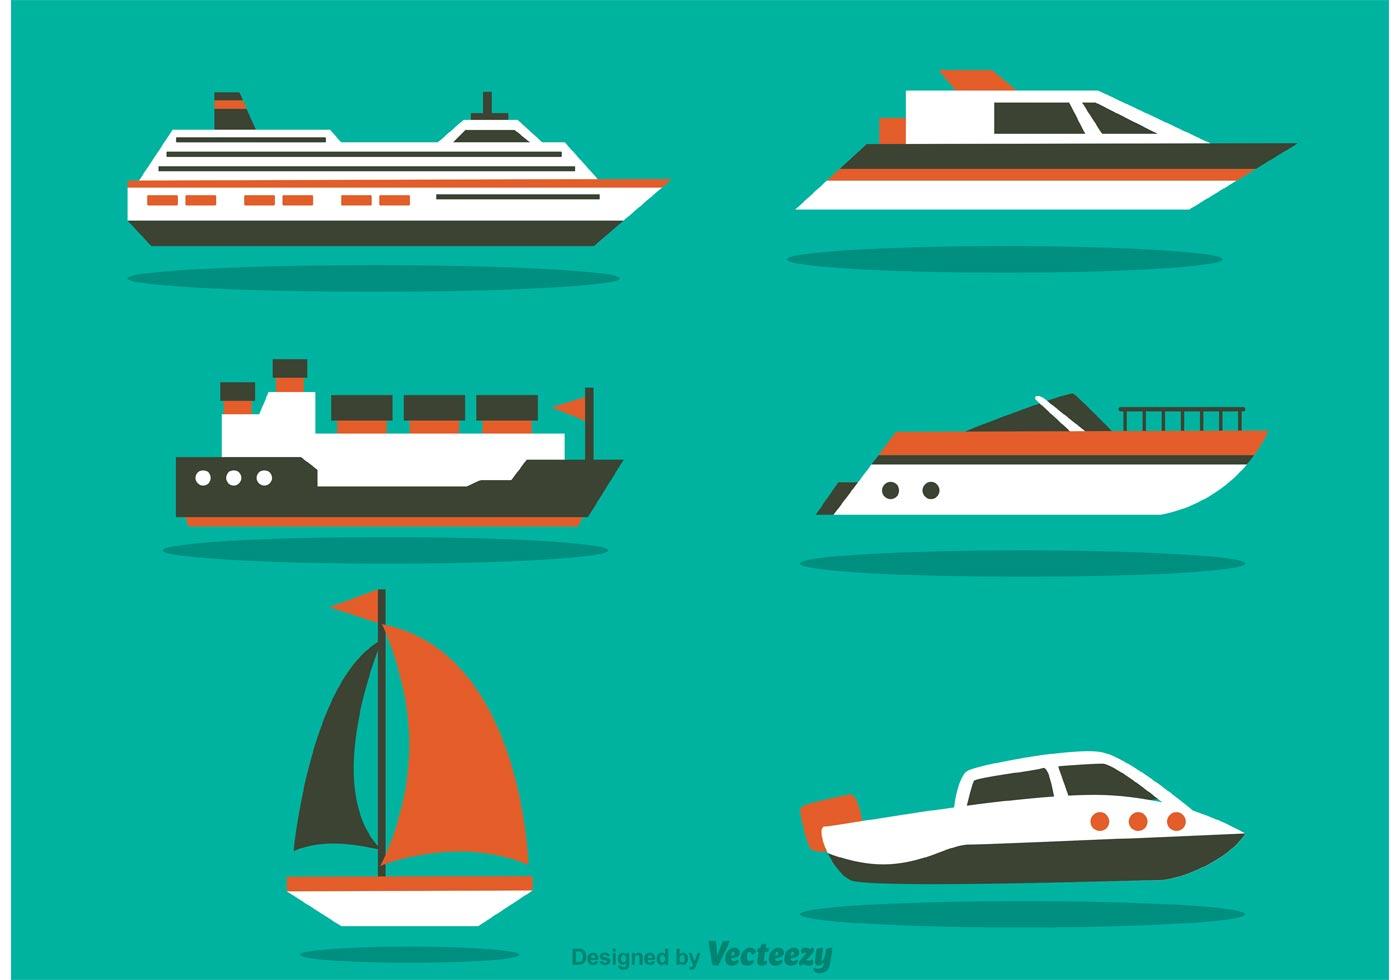 ship vector sets download free vector art stock graphics images rh vecteezy com ship vector art ship victory dartmouth